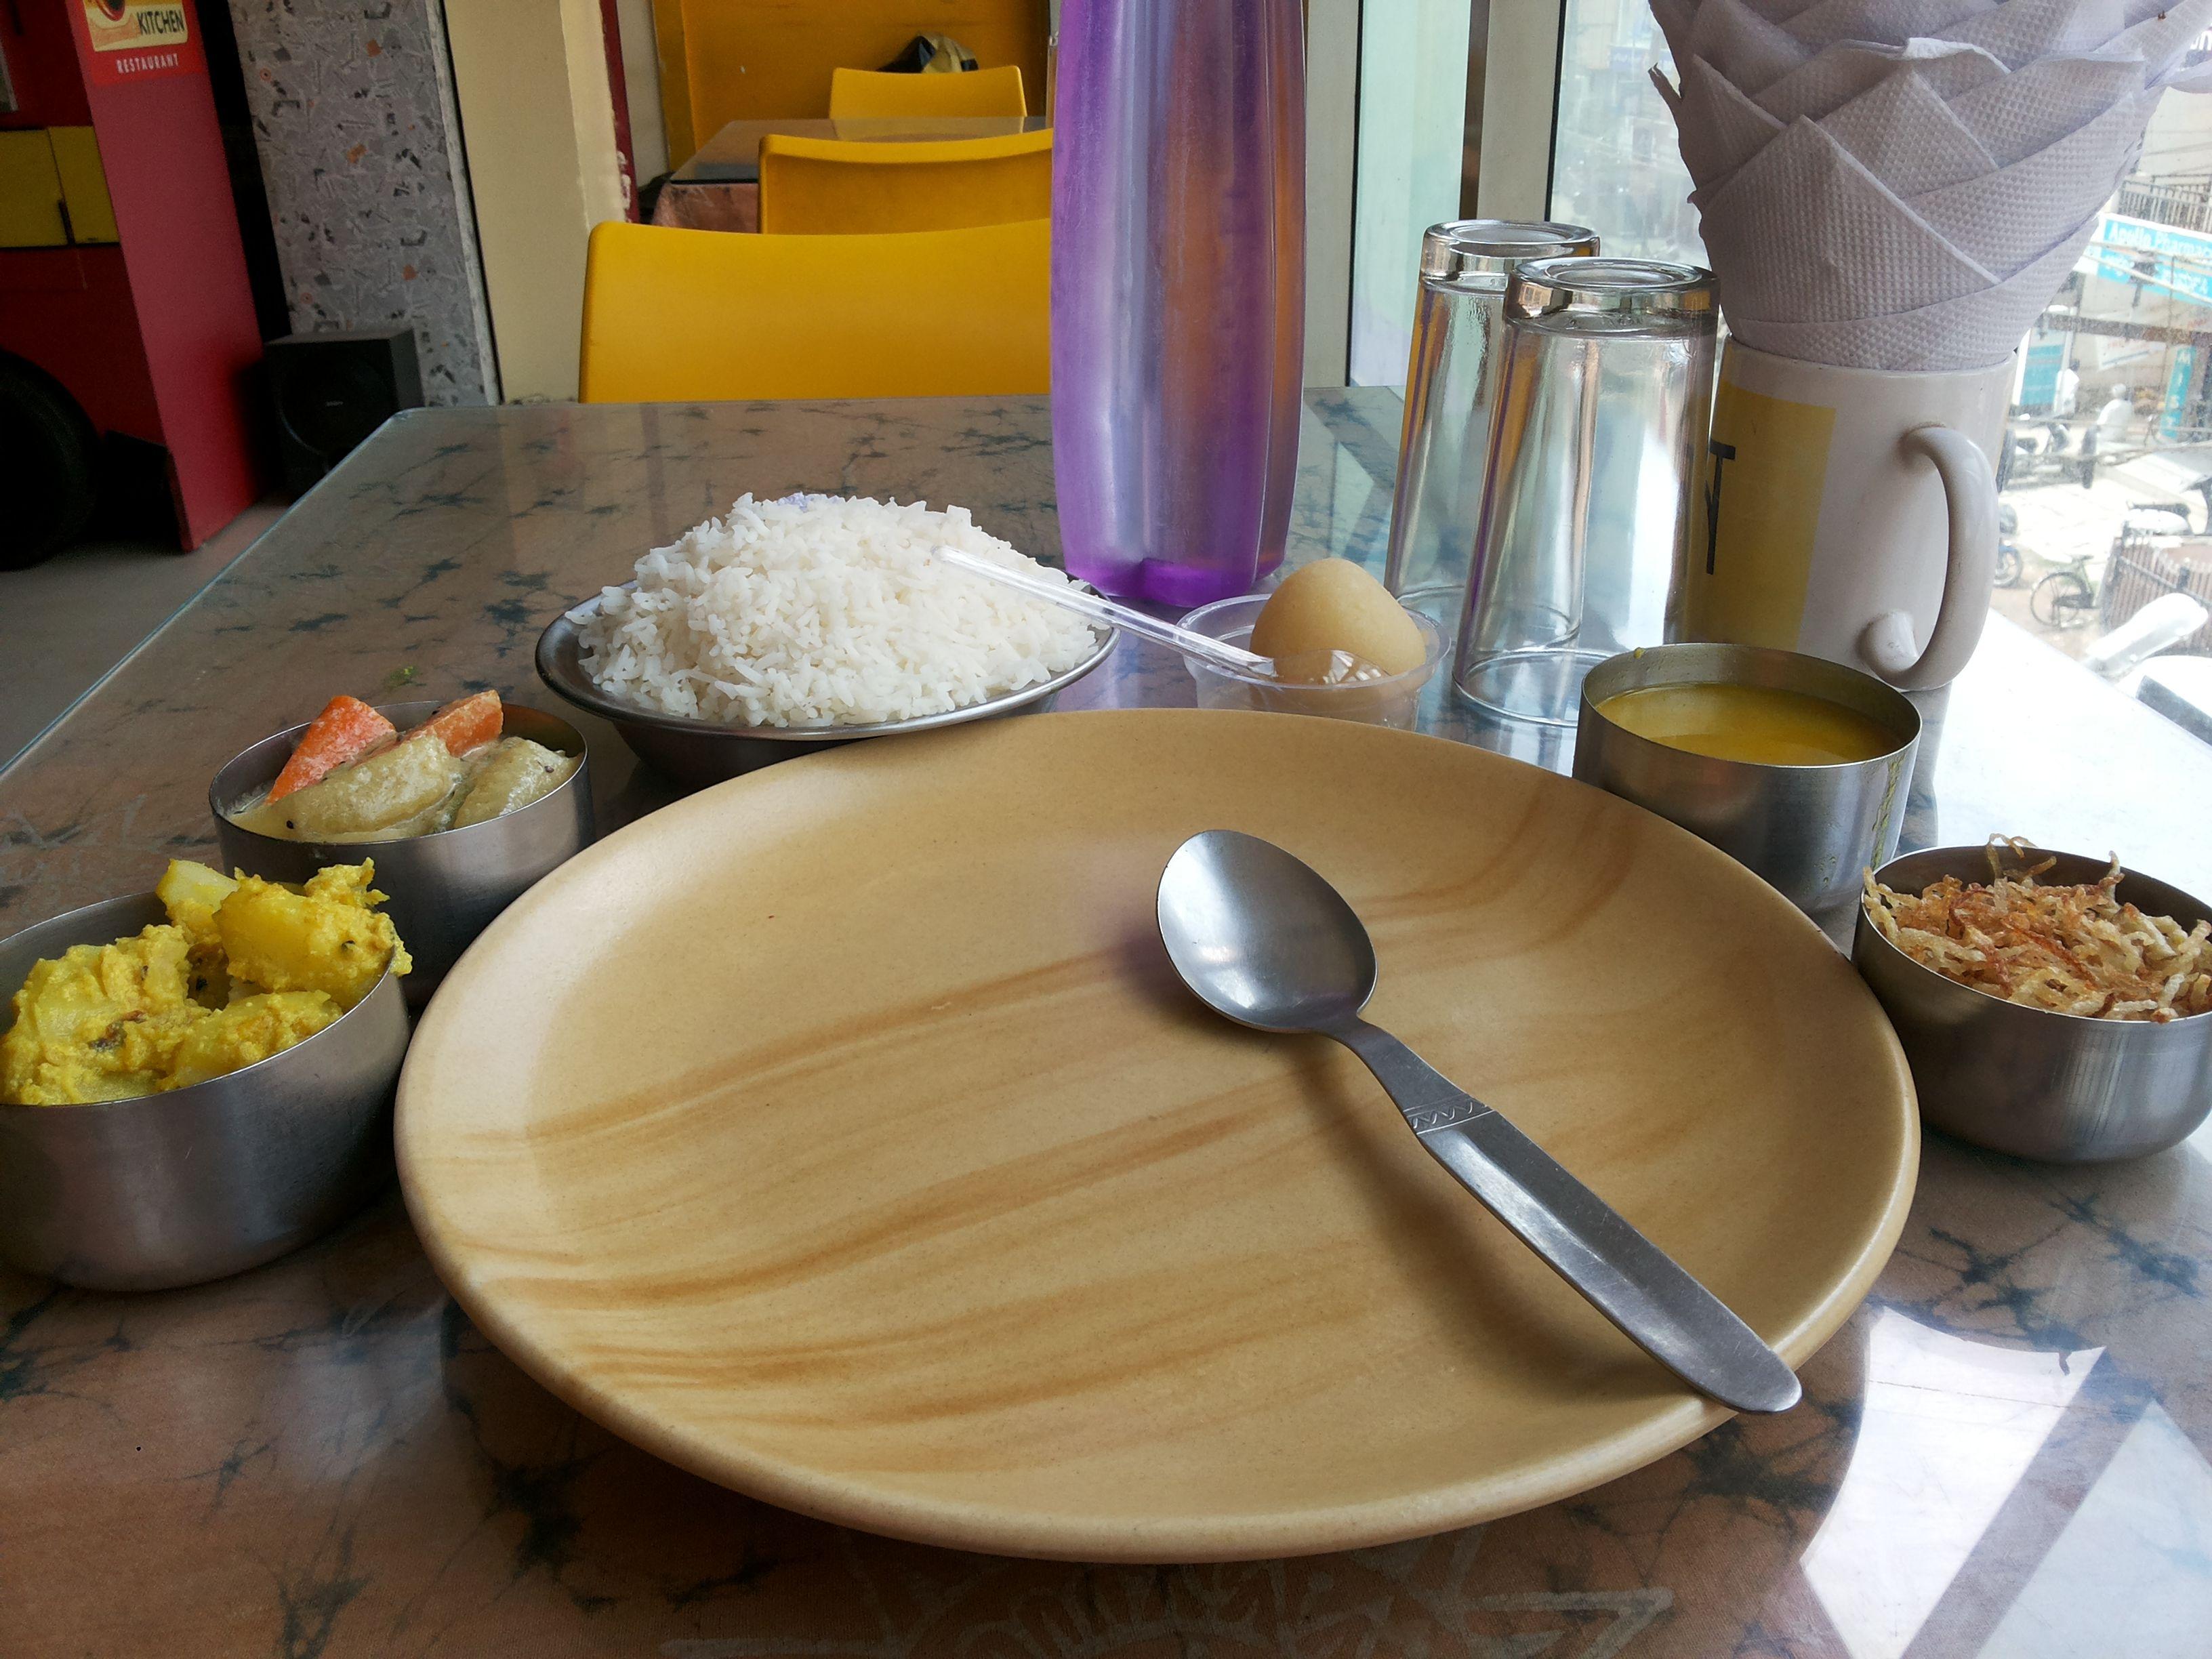 Authentic Bengali vegetarian meal - aaloo posto, aloo jhuri bhaja ...